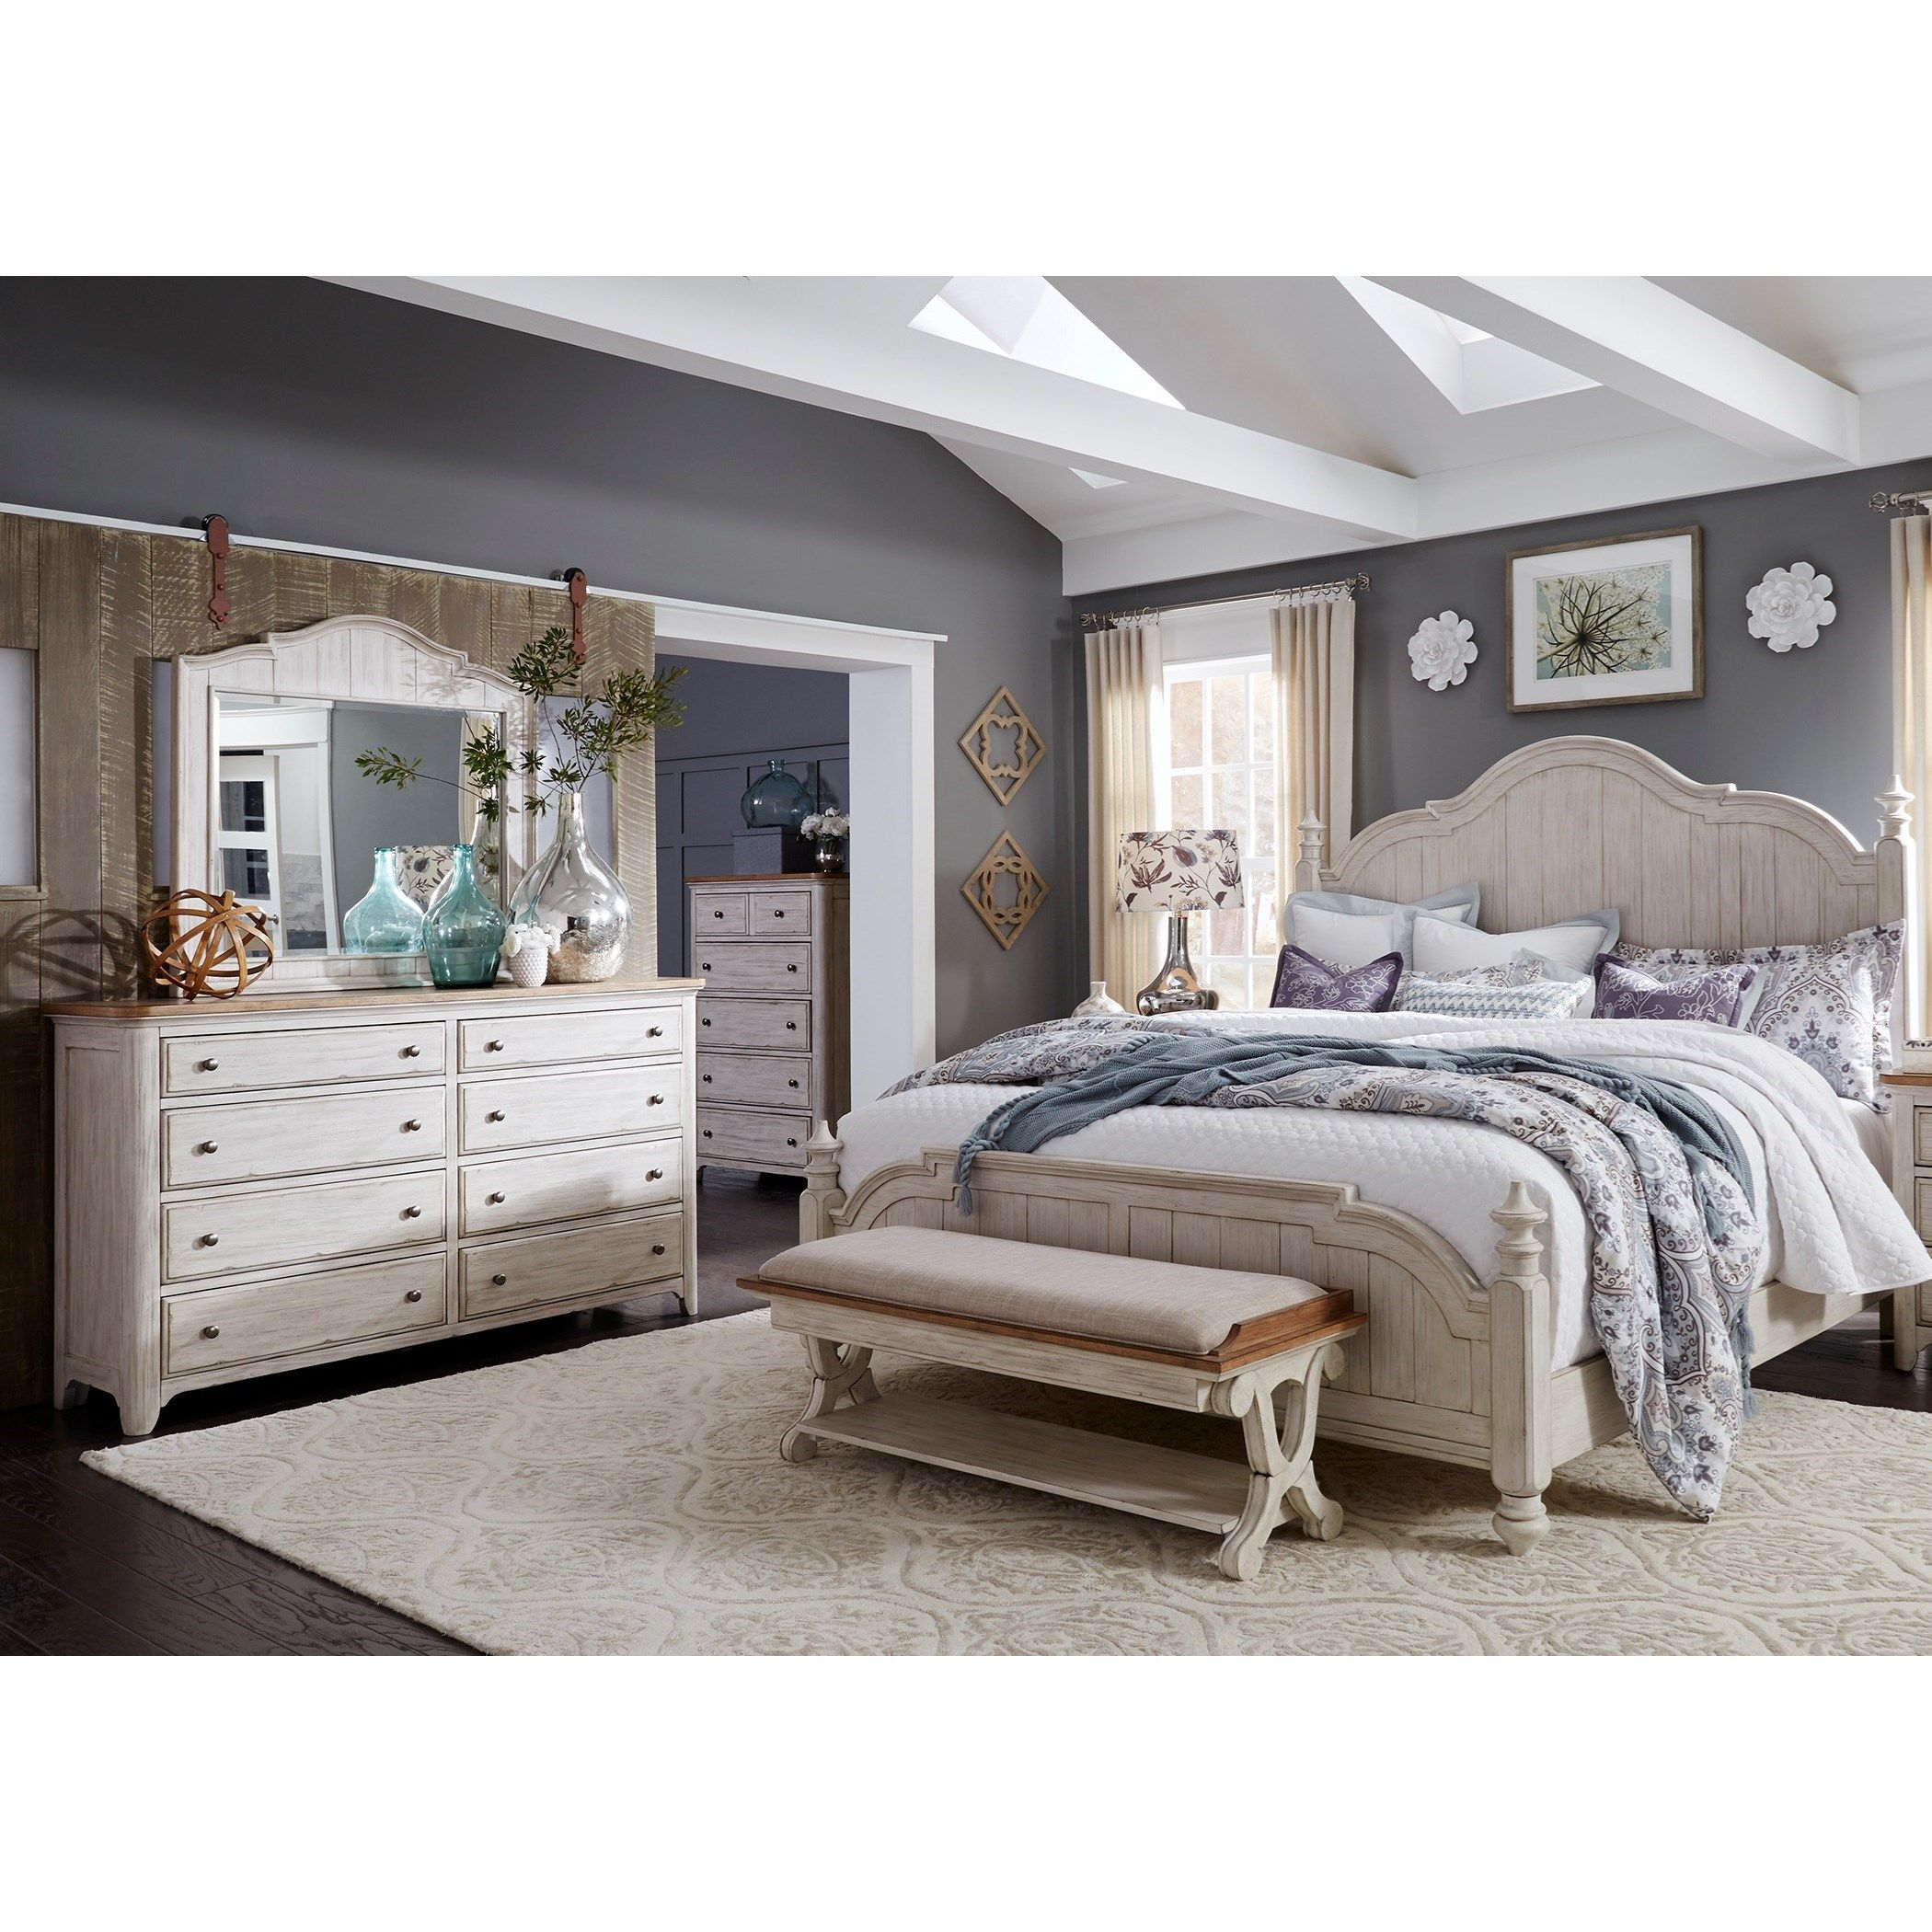 Farmhouse Reimagined King Bedroom Group By Liberty Furniture Farmhouse Master Bedroom Bedroom Furniture Sets Bedroom Sets